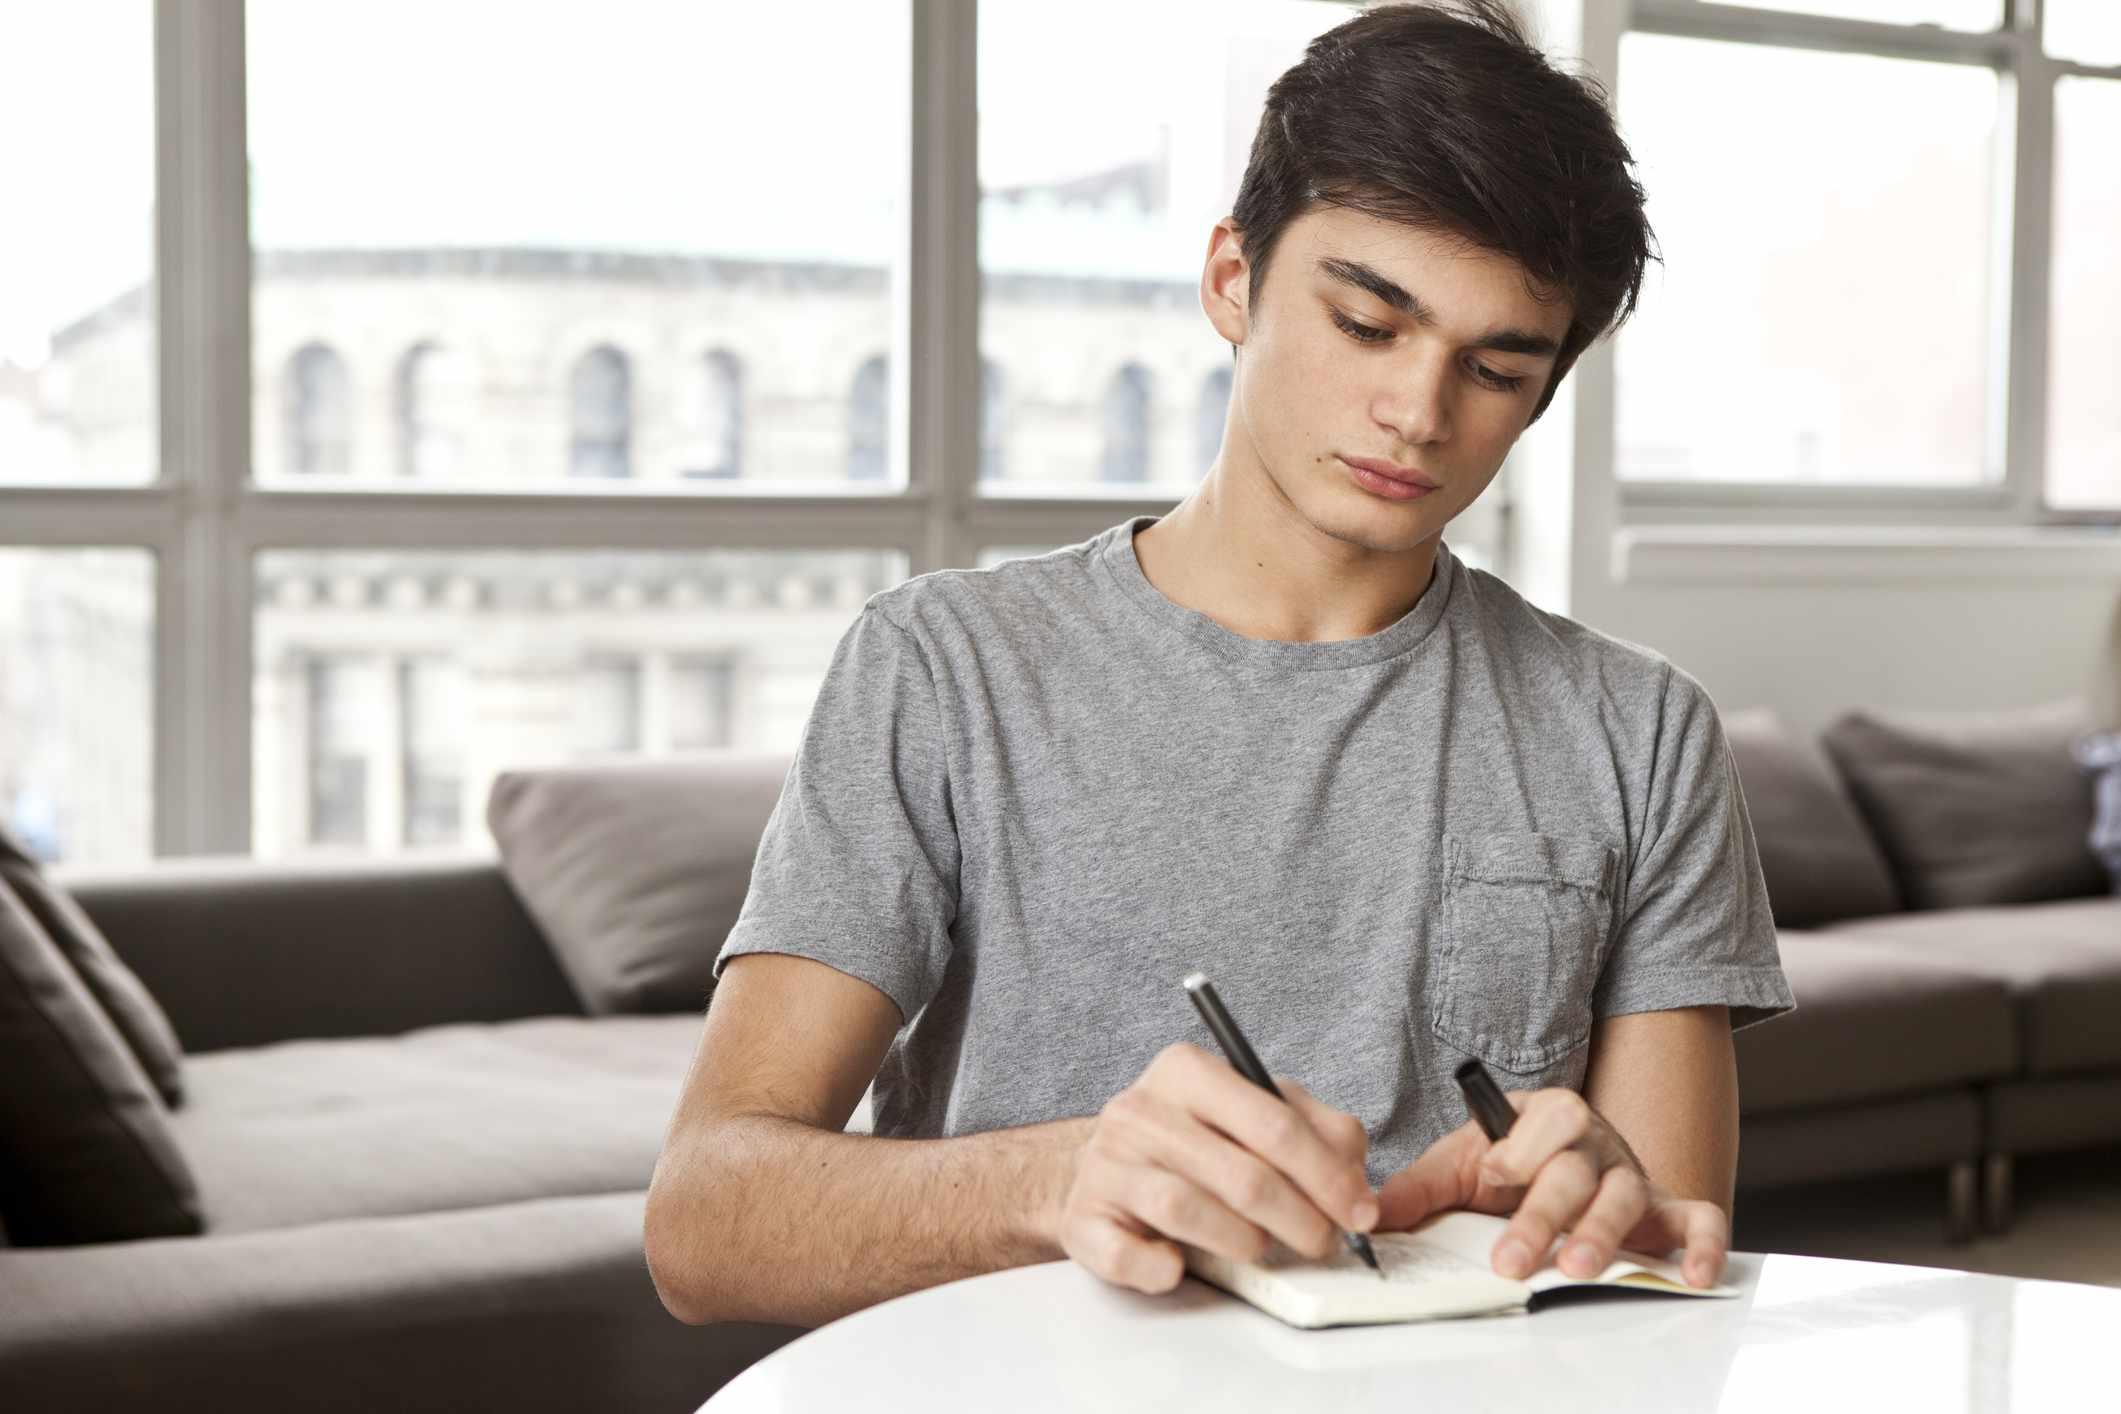 Teenager writing at home